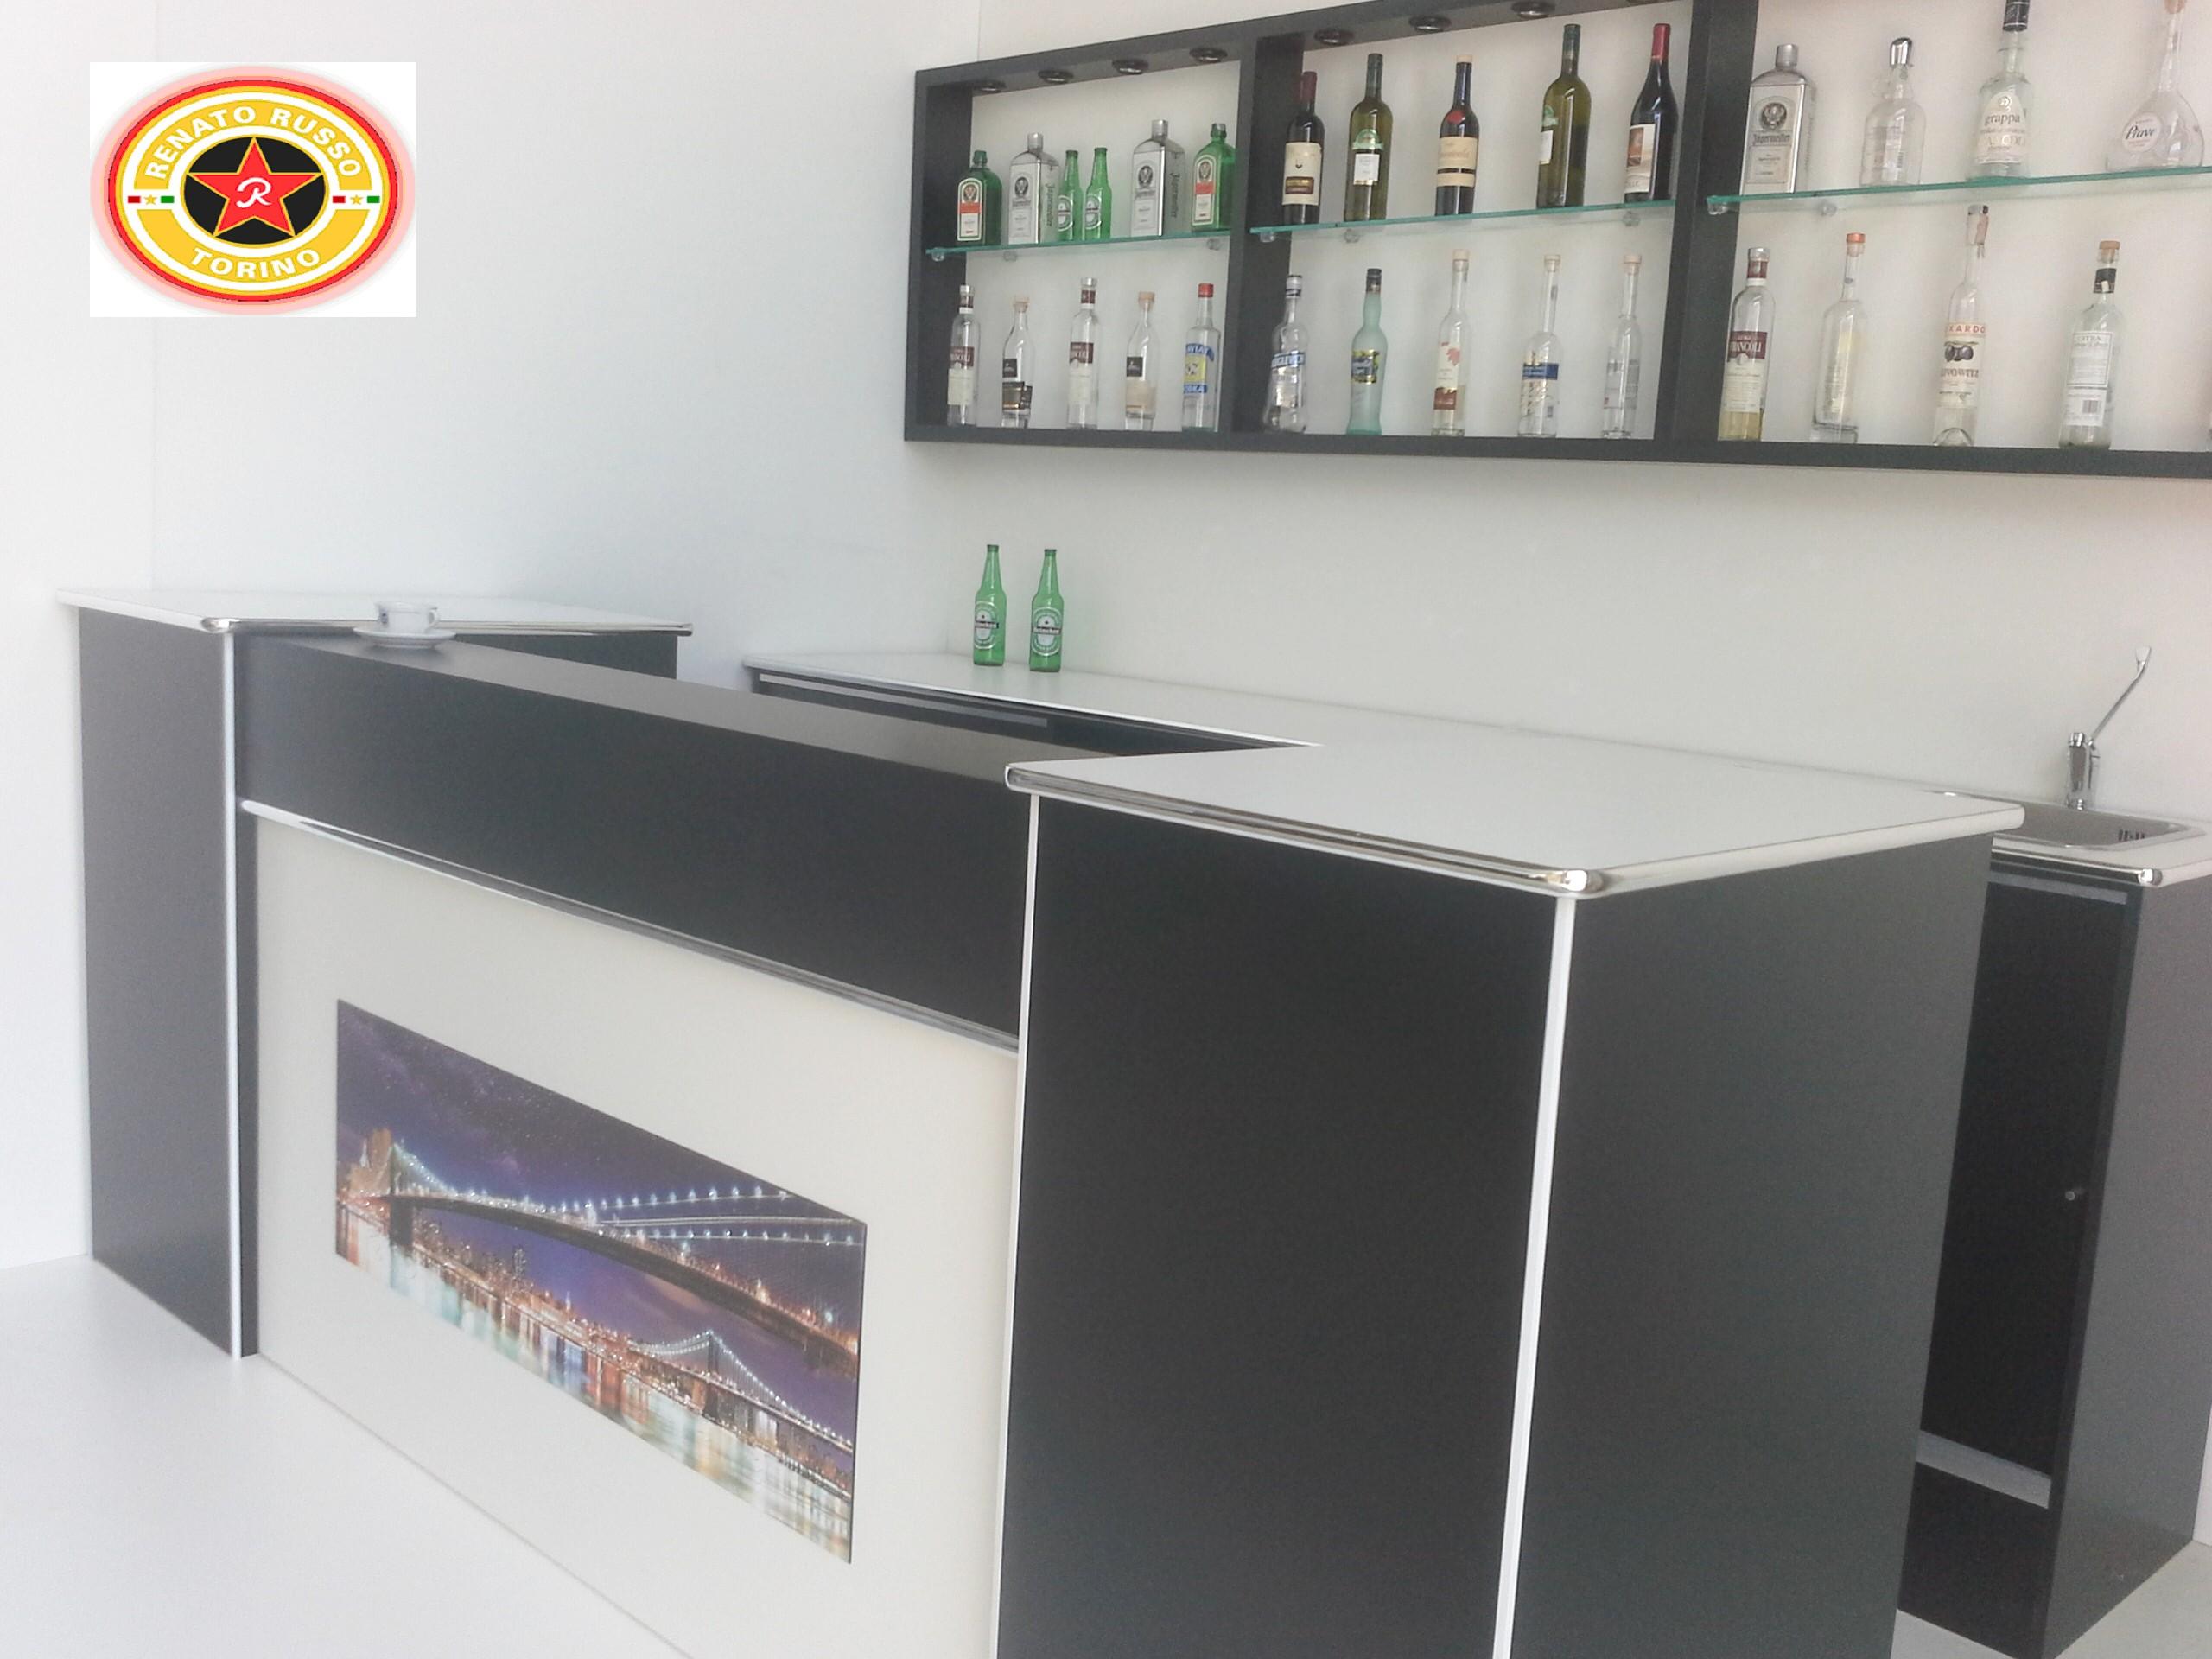 Banconi Bar Vetrine Refrigerate Banchi Bar Da Rivestire